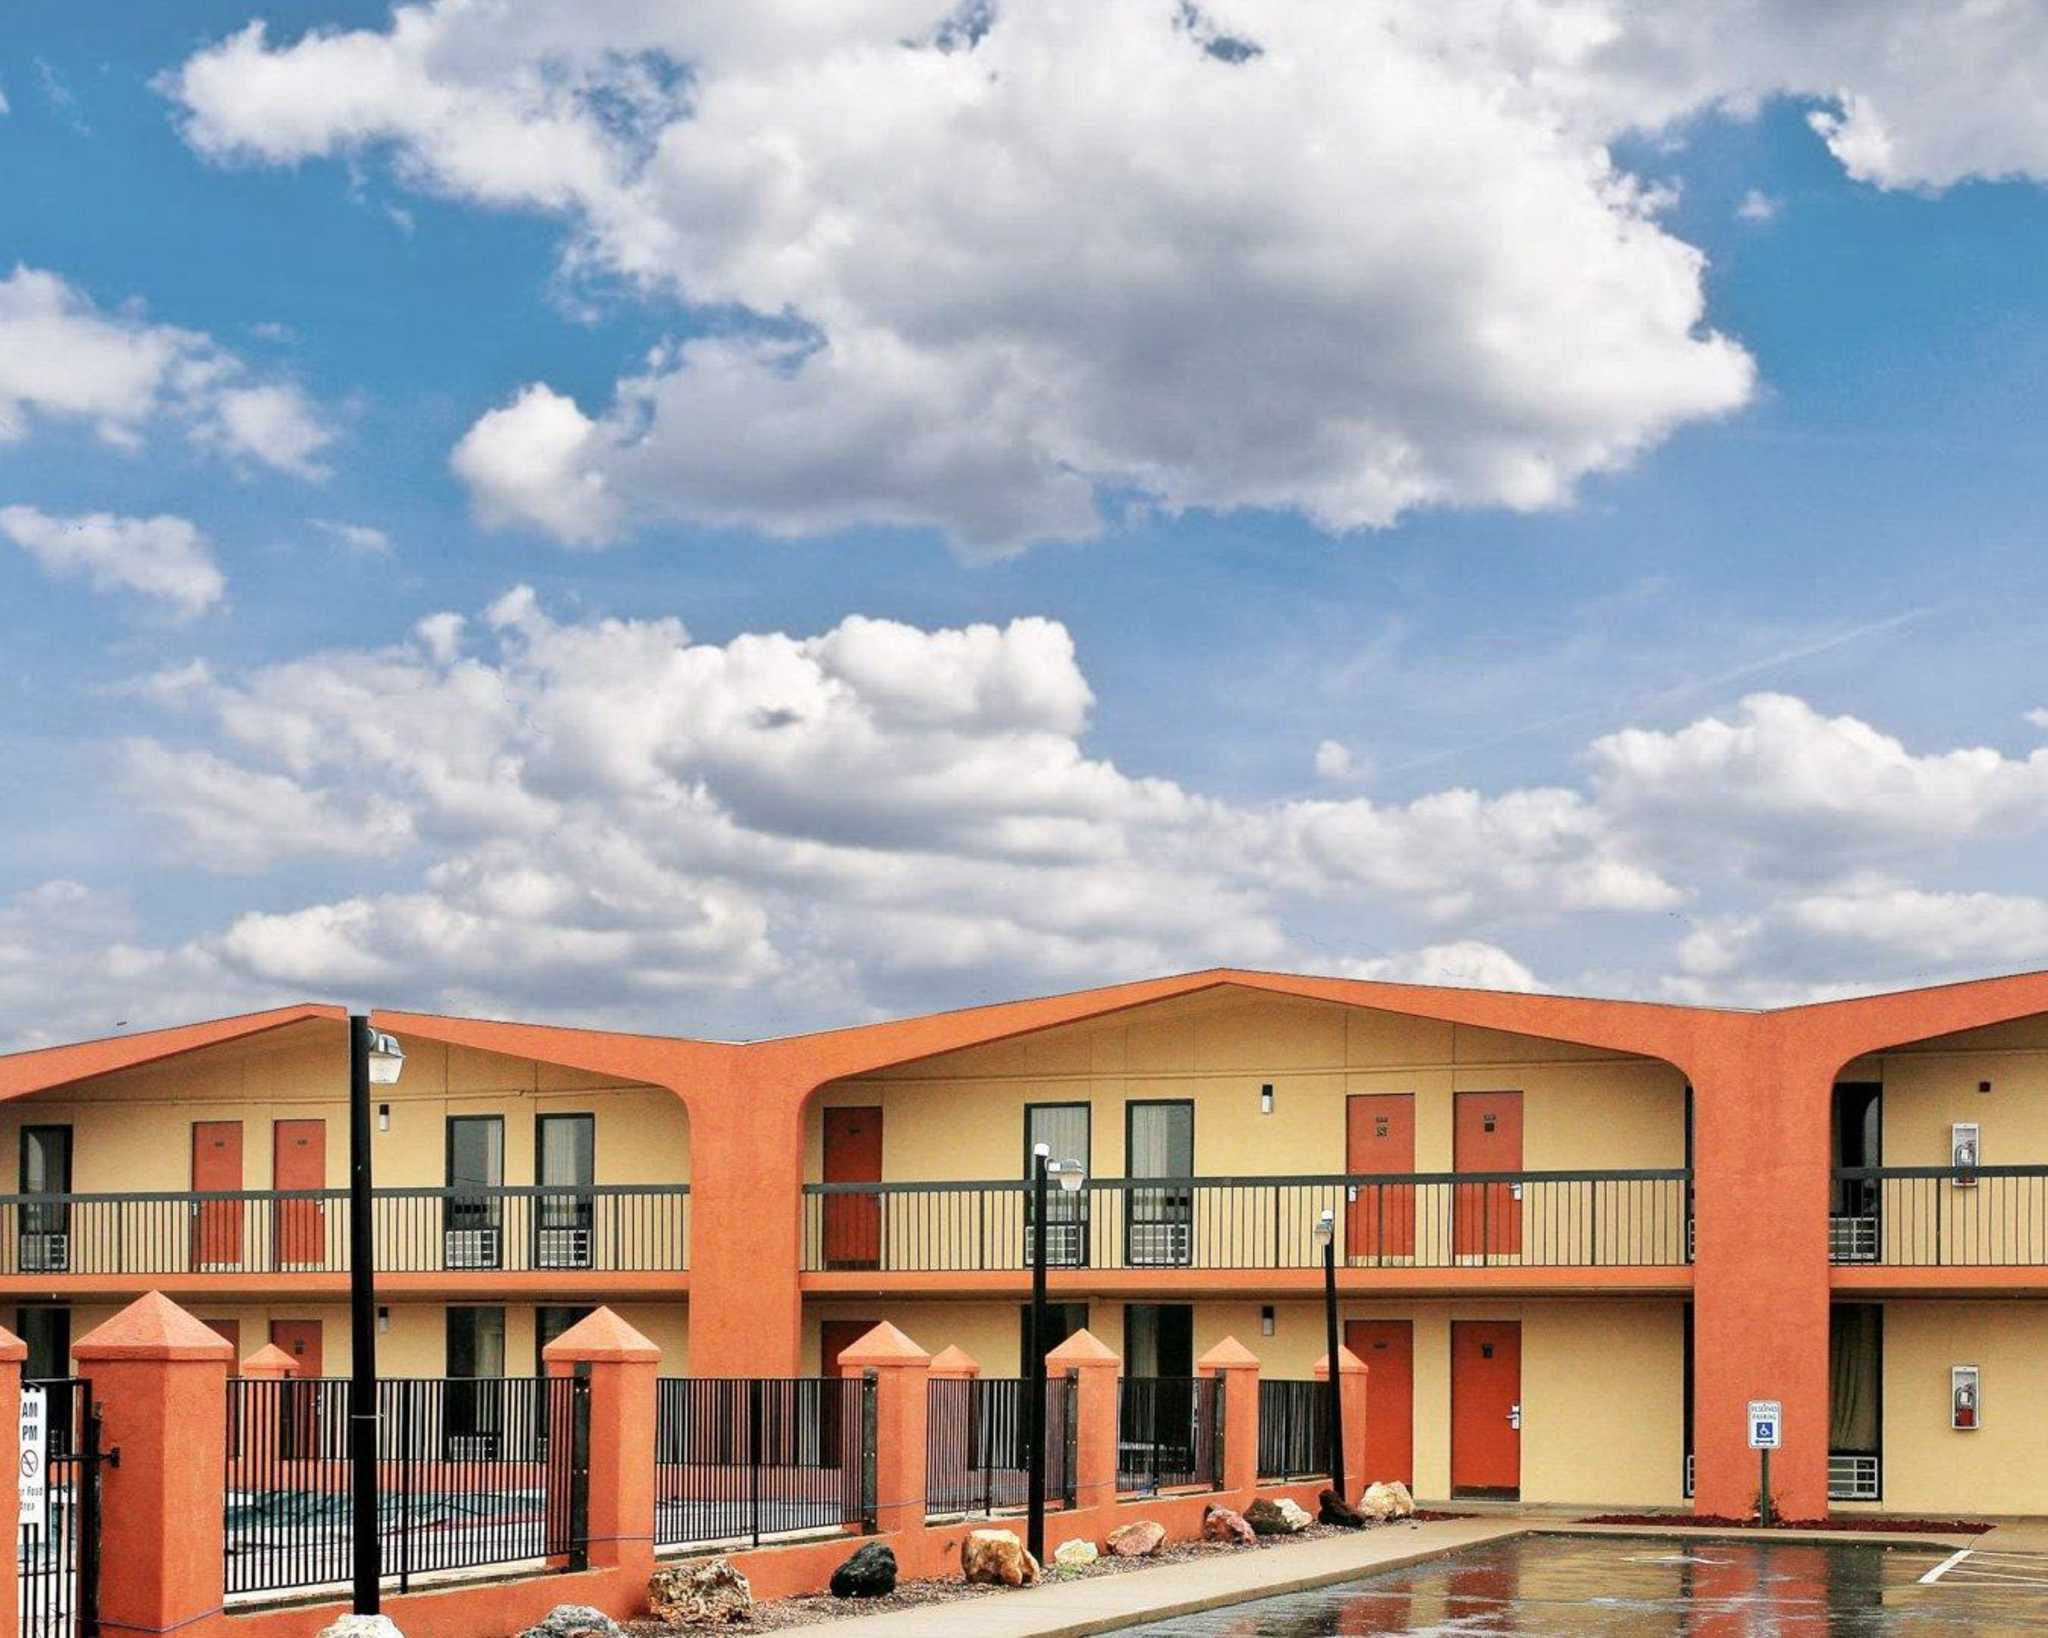 quality inn northwest in lexington ky 623 207 7. Black Bedroom Furniture Sets. Home Design Ideas